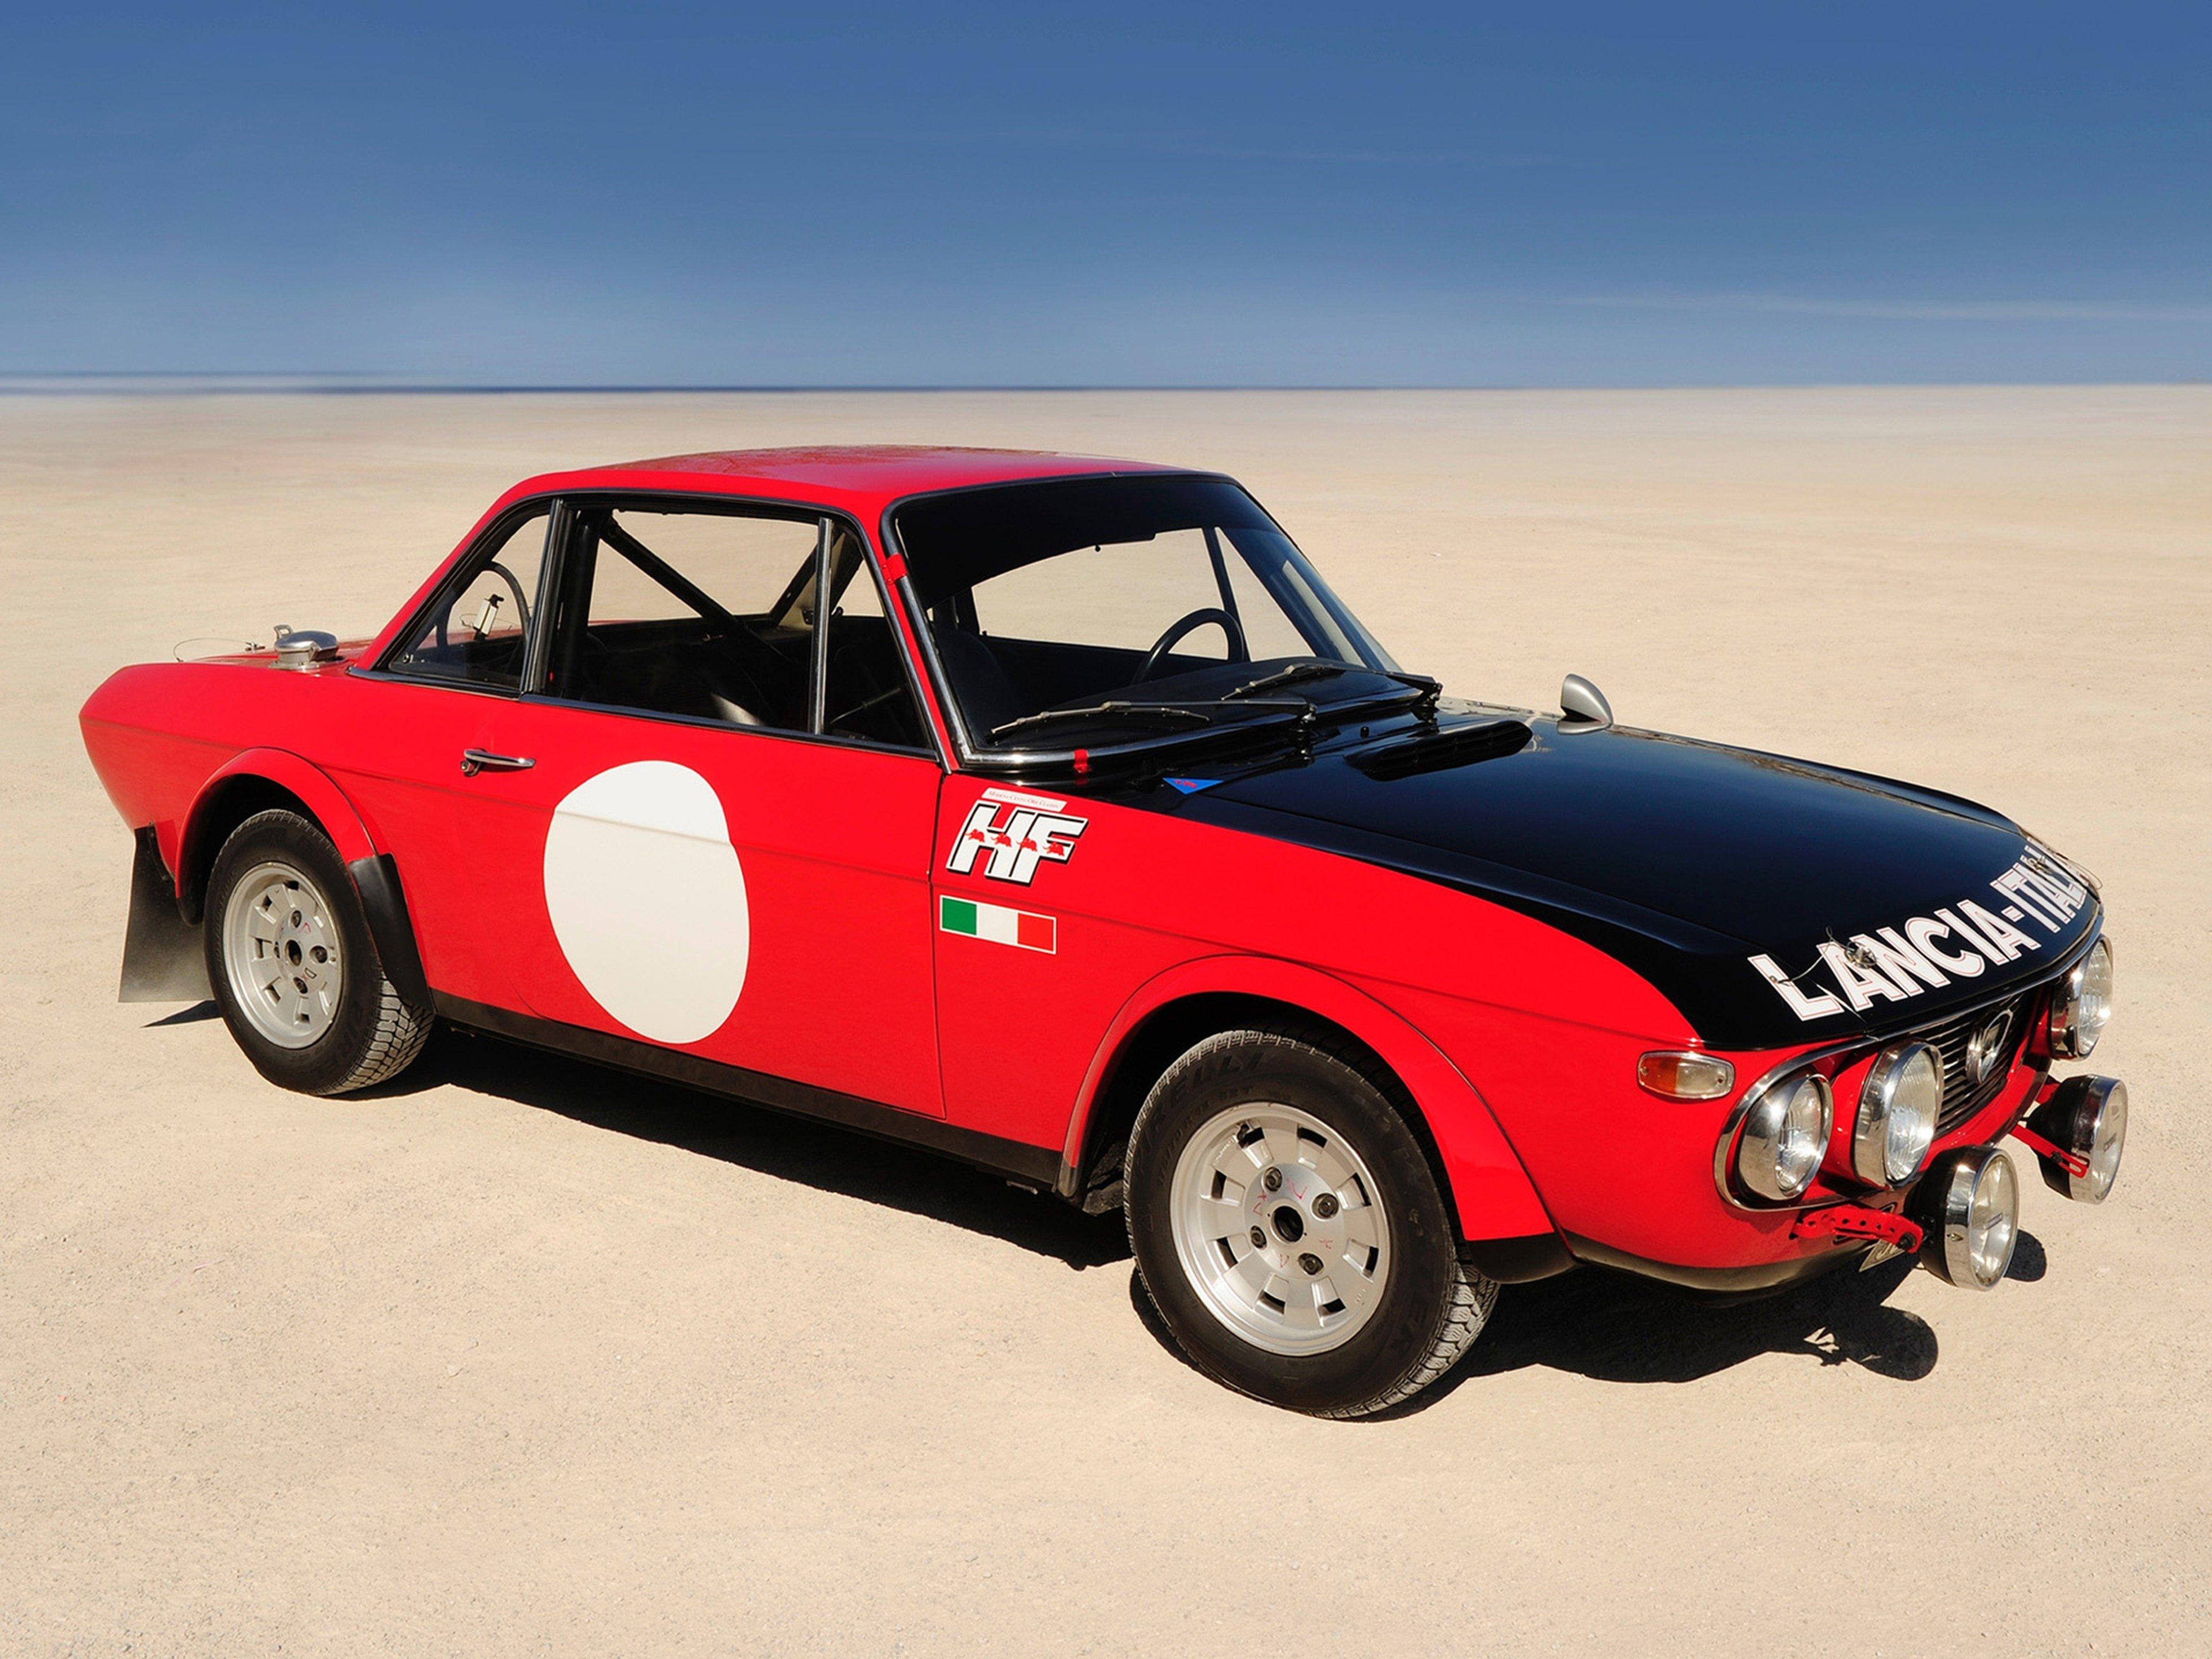 1970 Lancia Fulvia Coupe 1600HF Corsa Race Rally Car ...